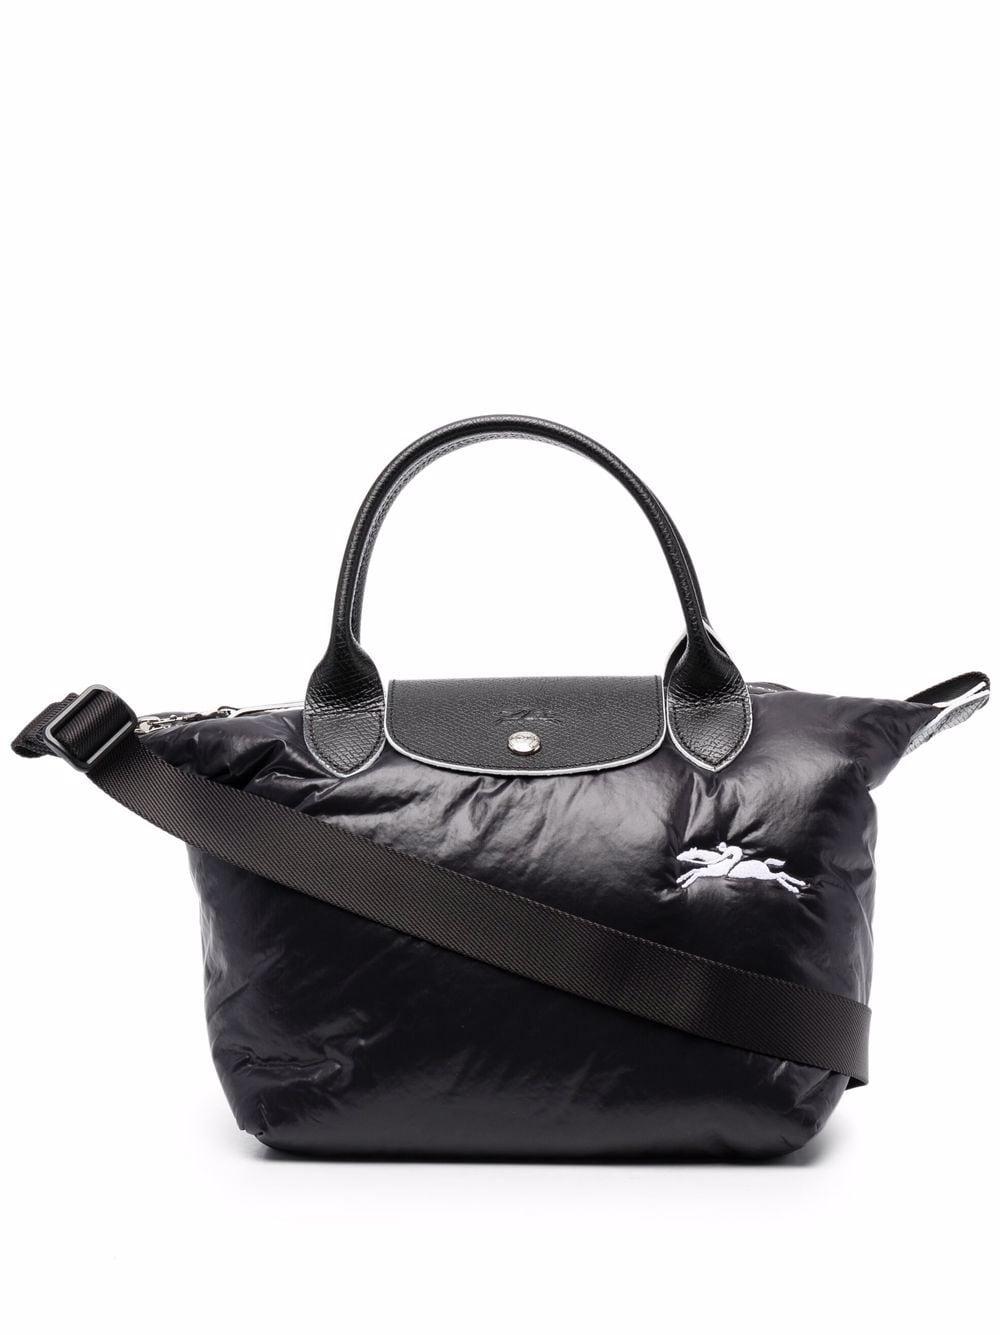 Longchamp Le Pliage Alpin Handtasche - Schwarz